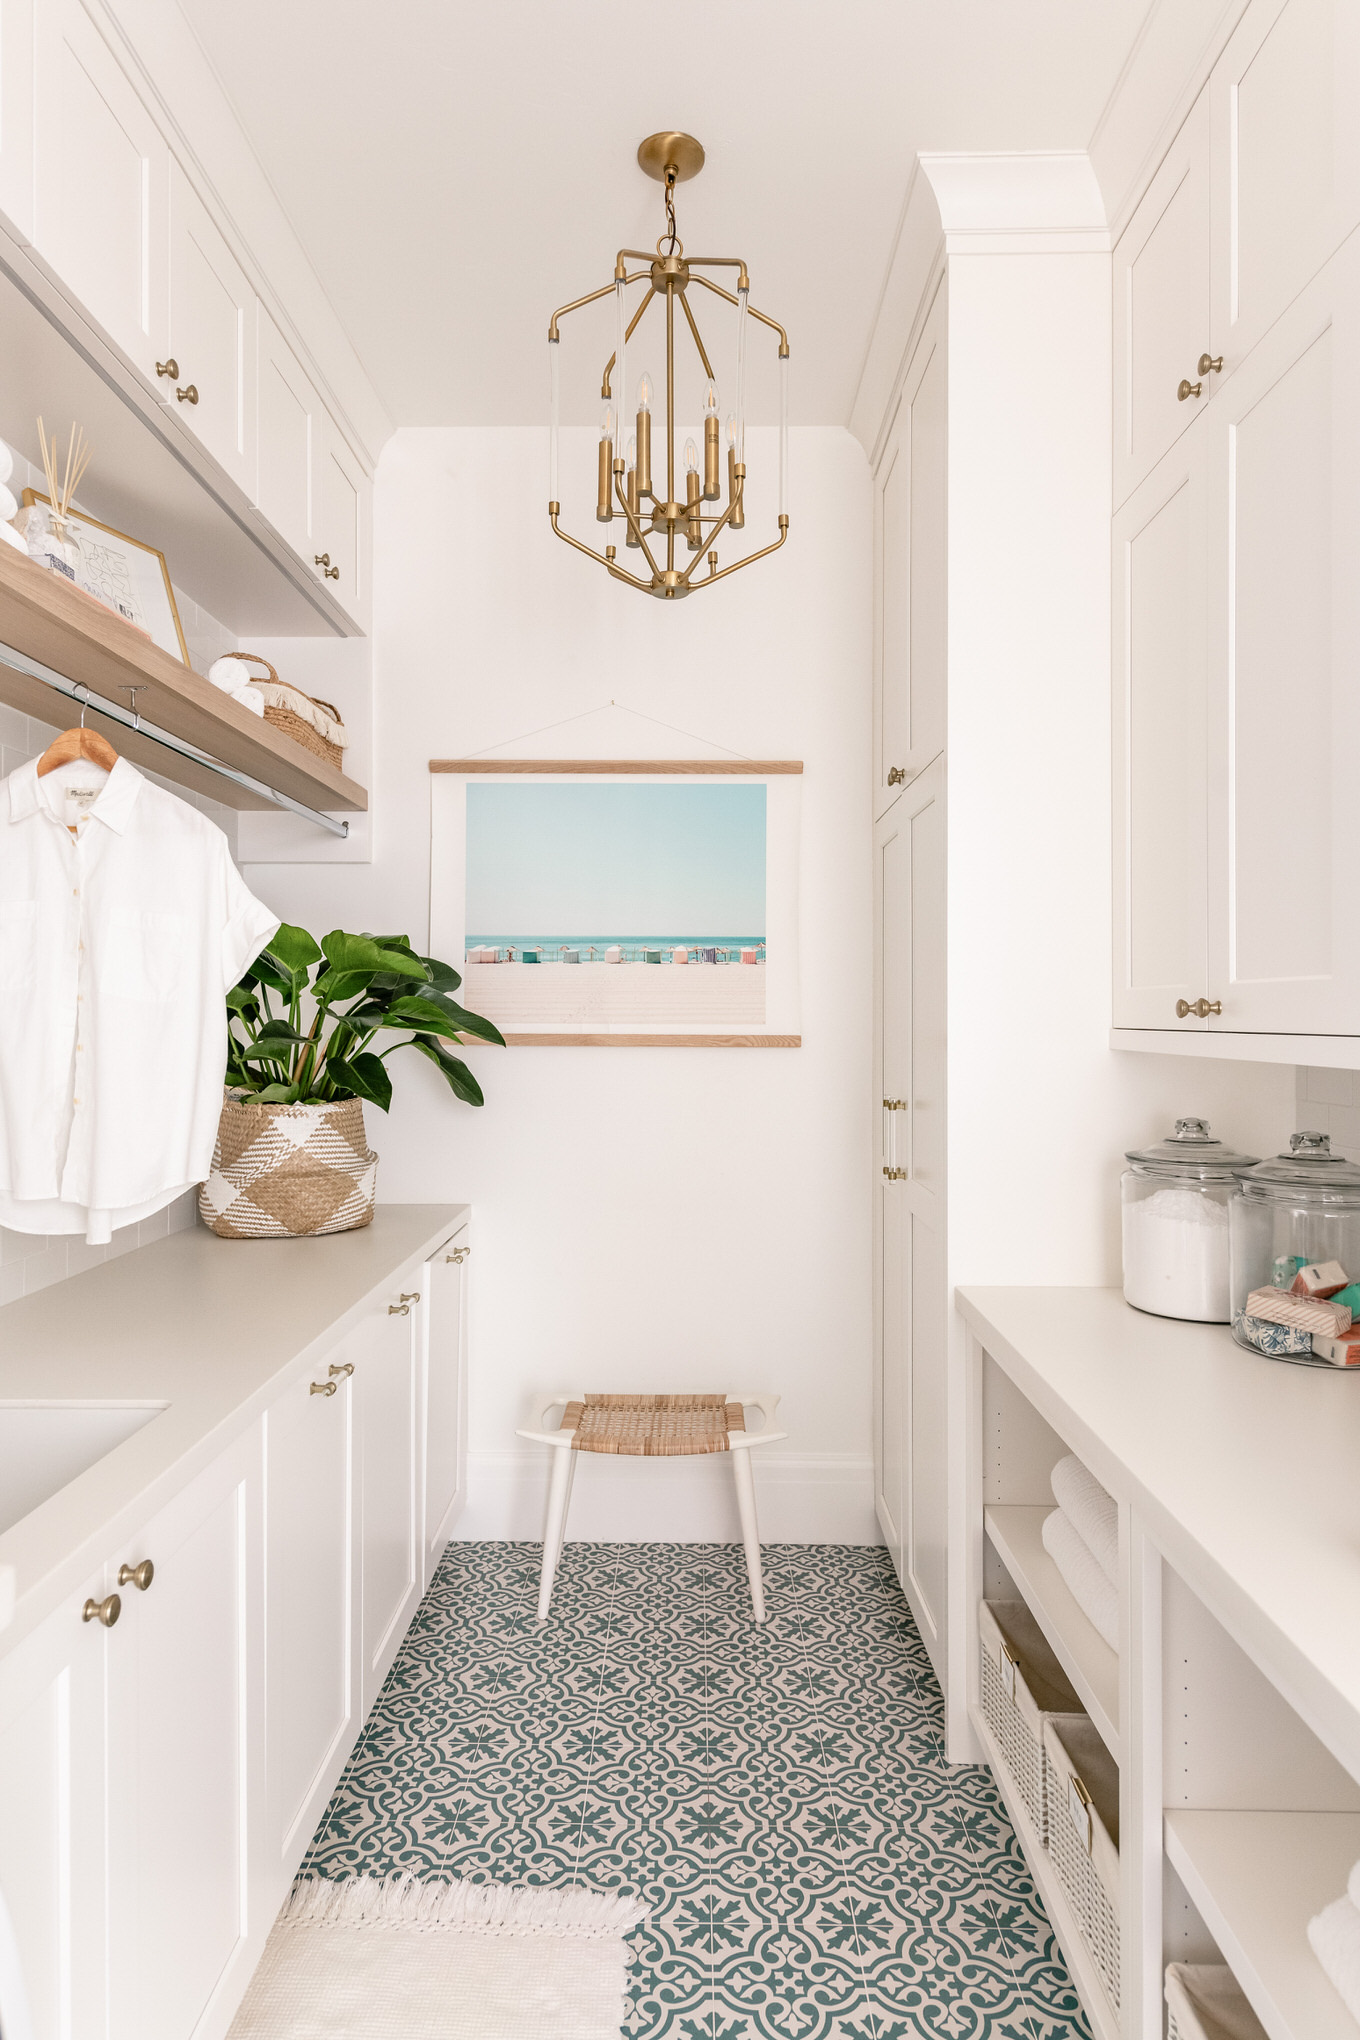 christine andrew laundry room reveal